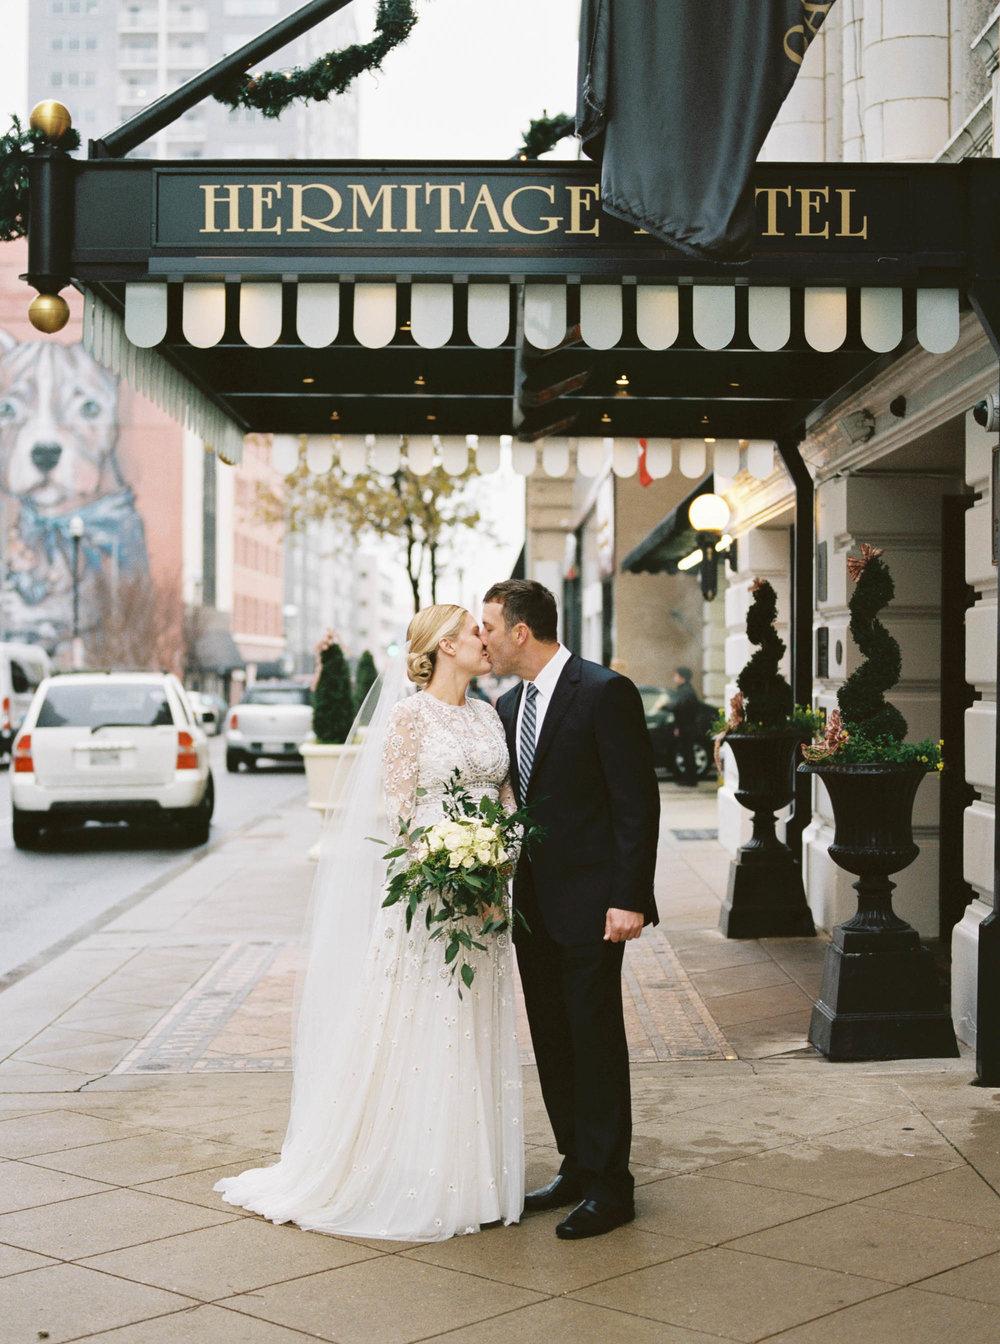 chris + jessica hermitage hotel wedding photographers nashville ©2017abigailbobophotography-13.jpg